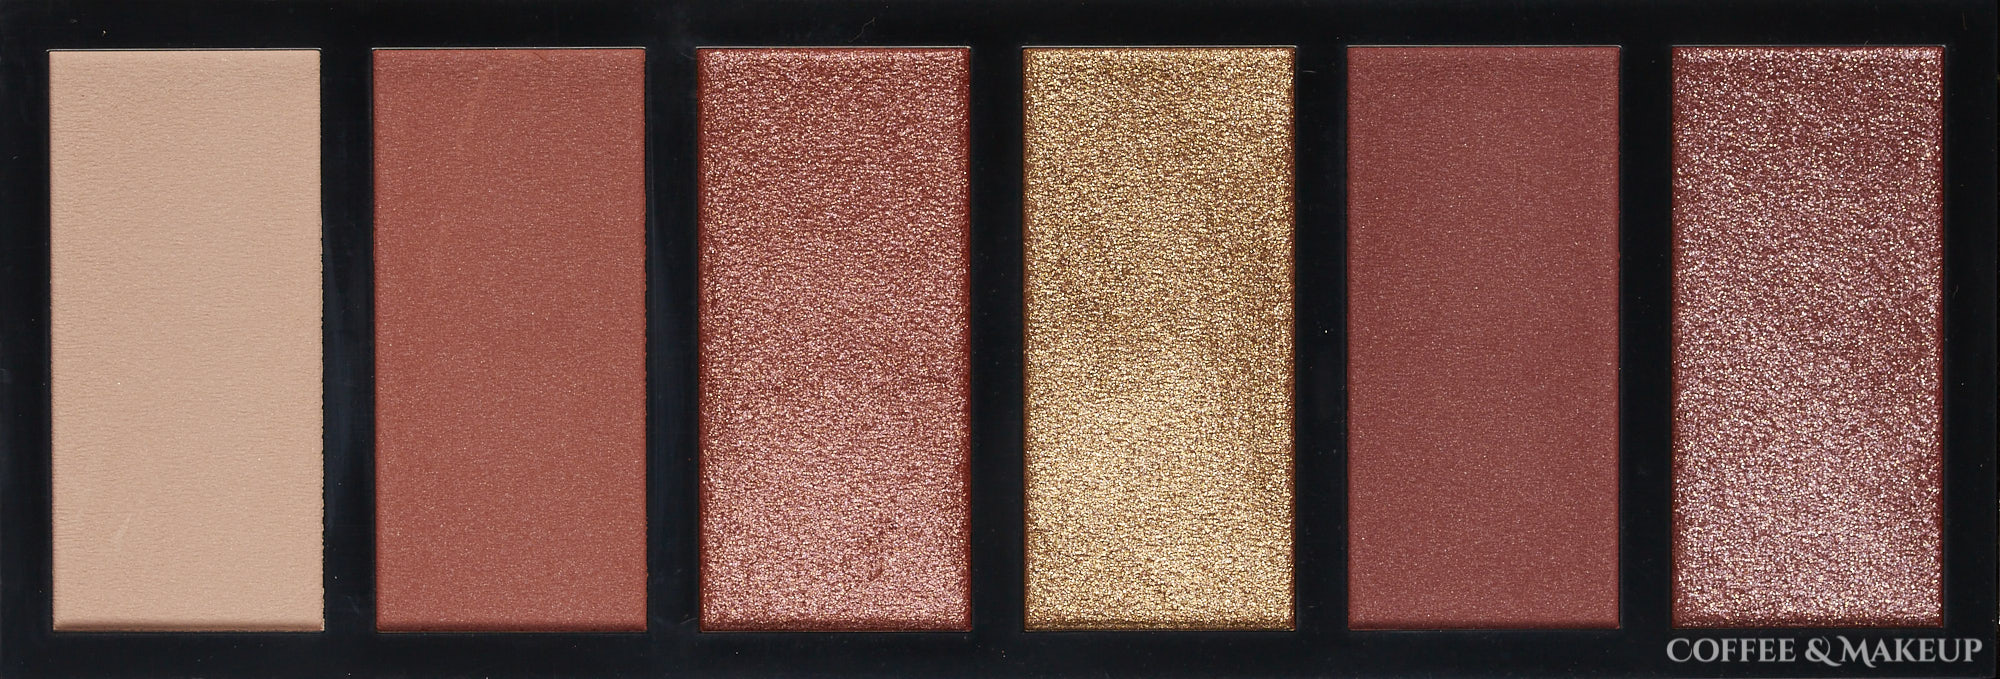 Milani Burning Desire Most Wanted Eyeshadow Palette